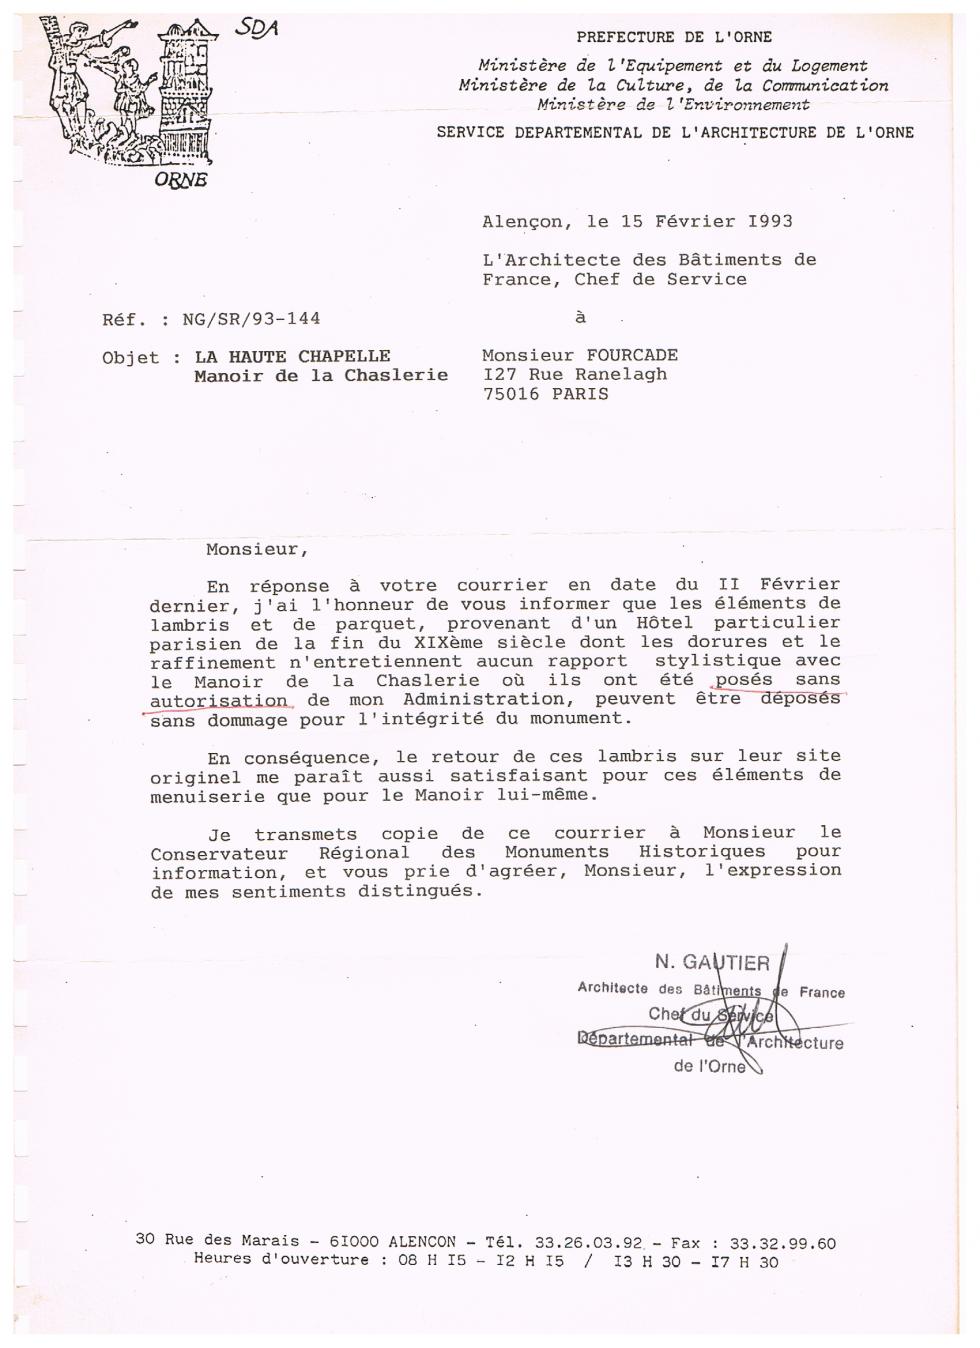 15 février 1993.